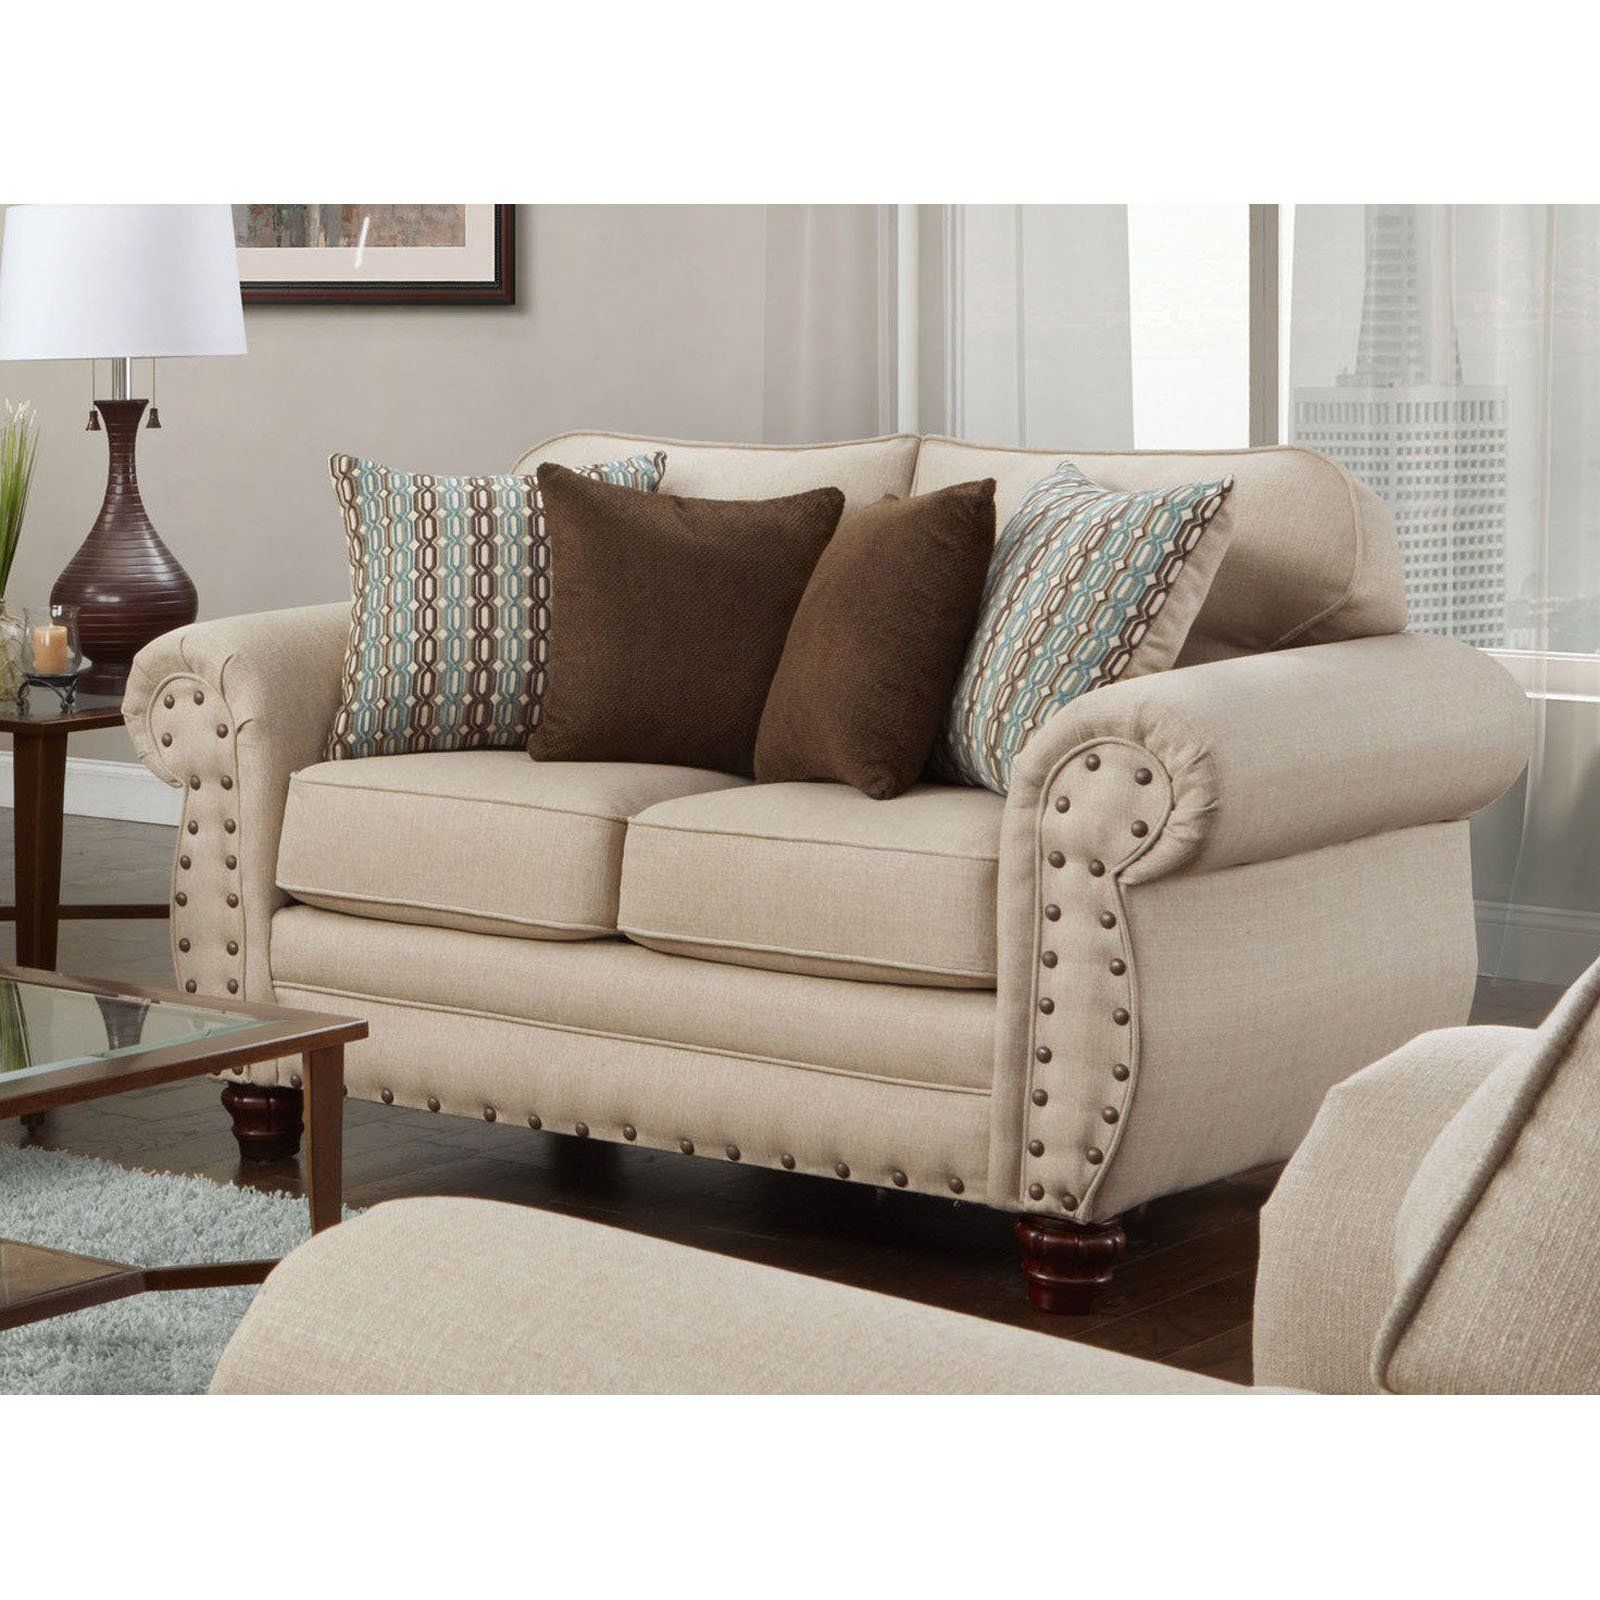 American Furniture Classics Abington Sand Loveseat Furniture